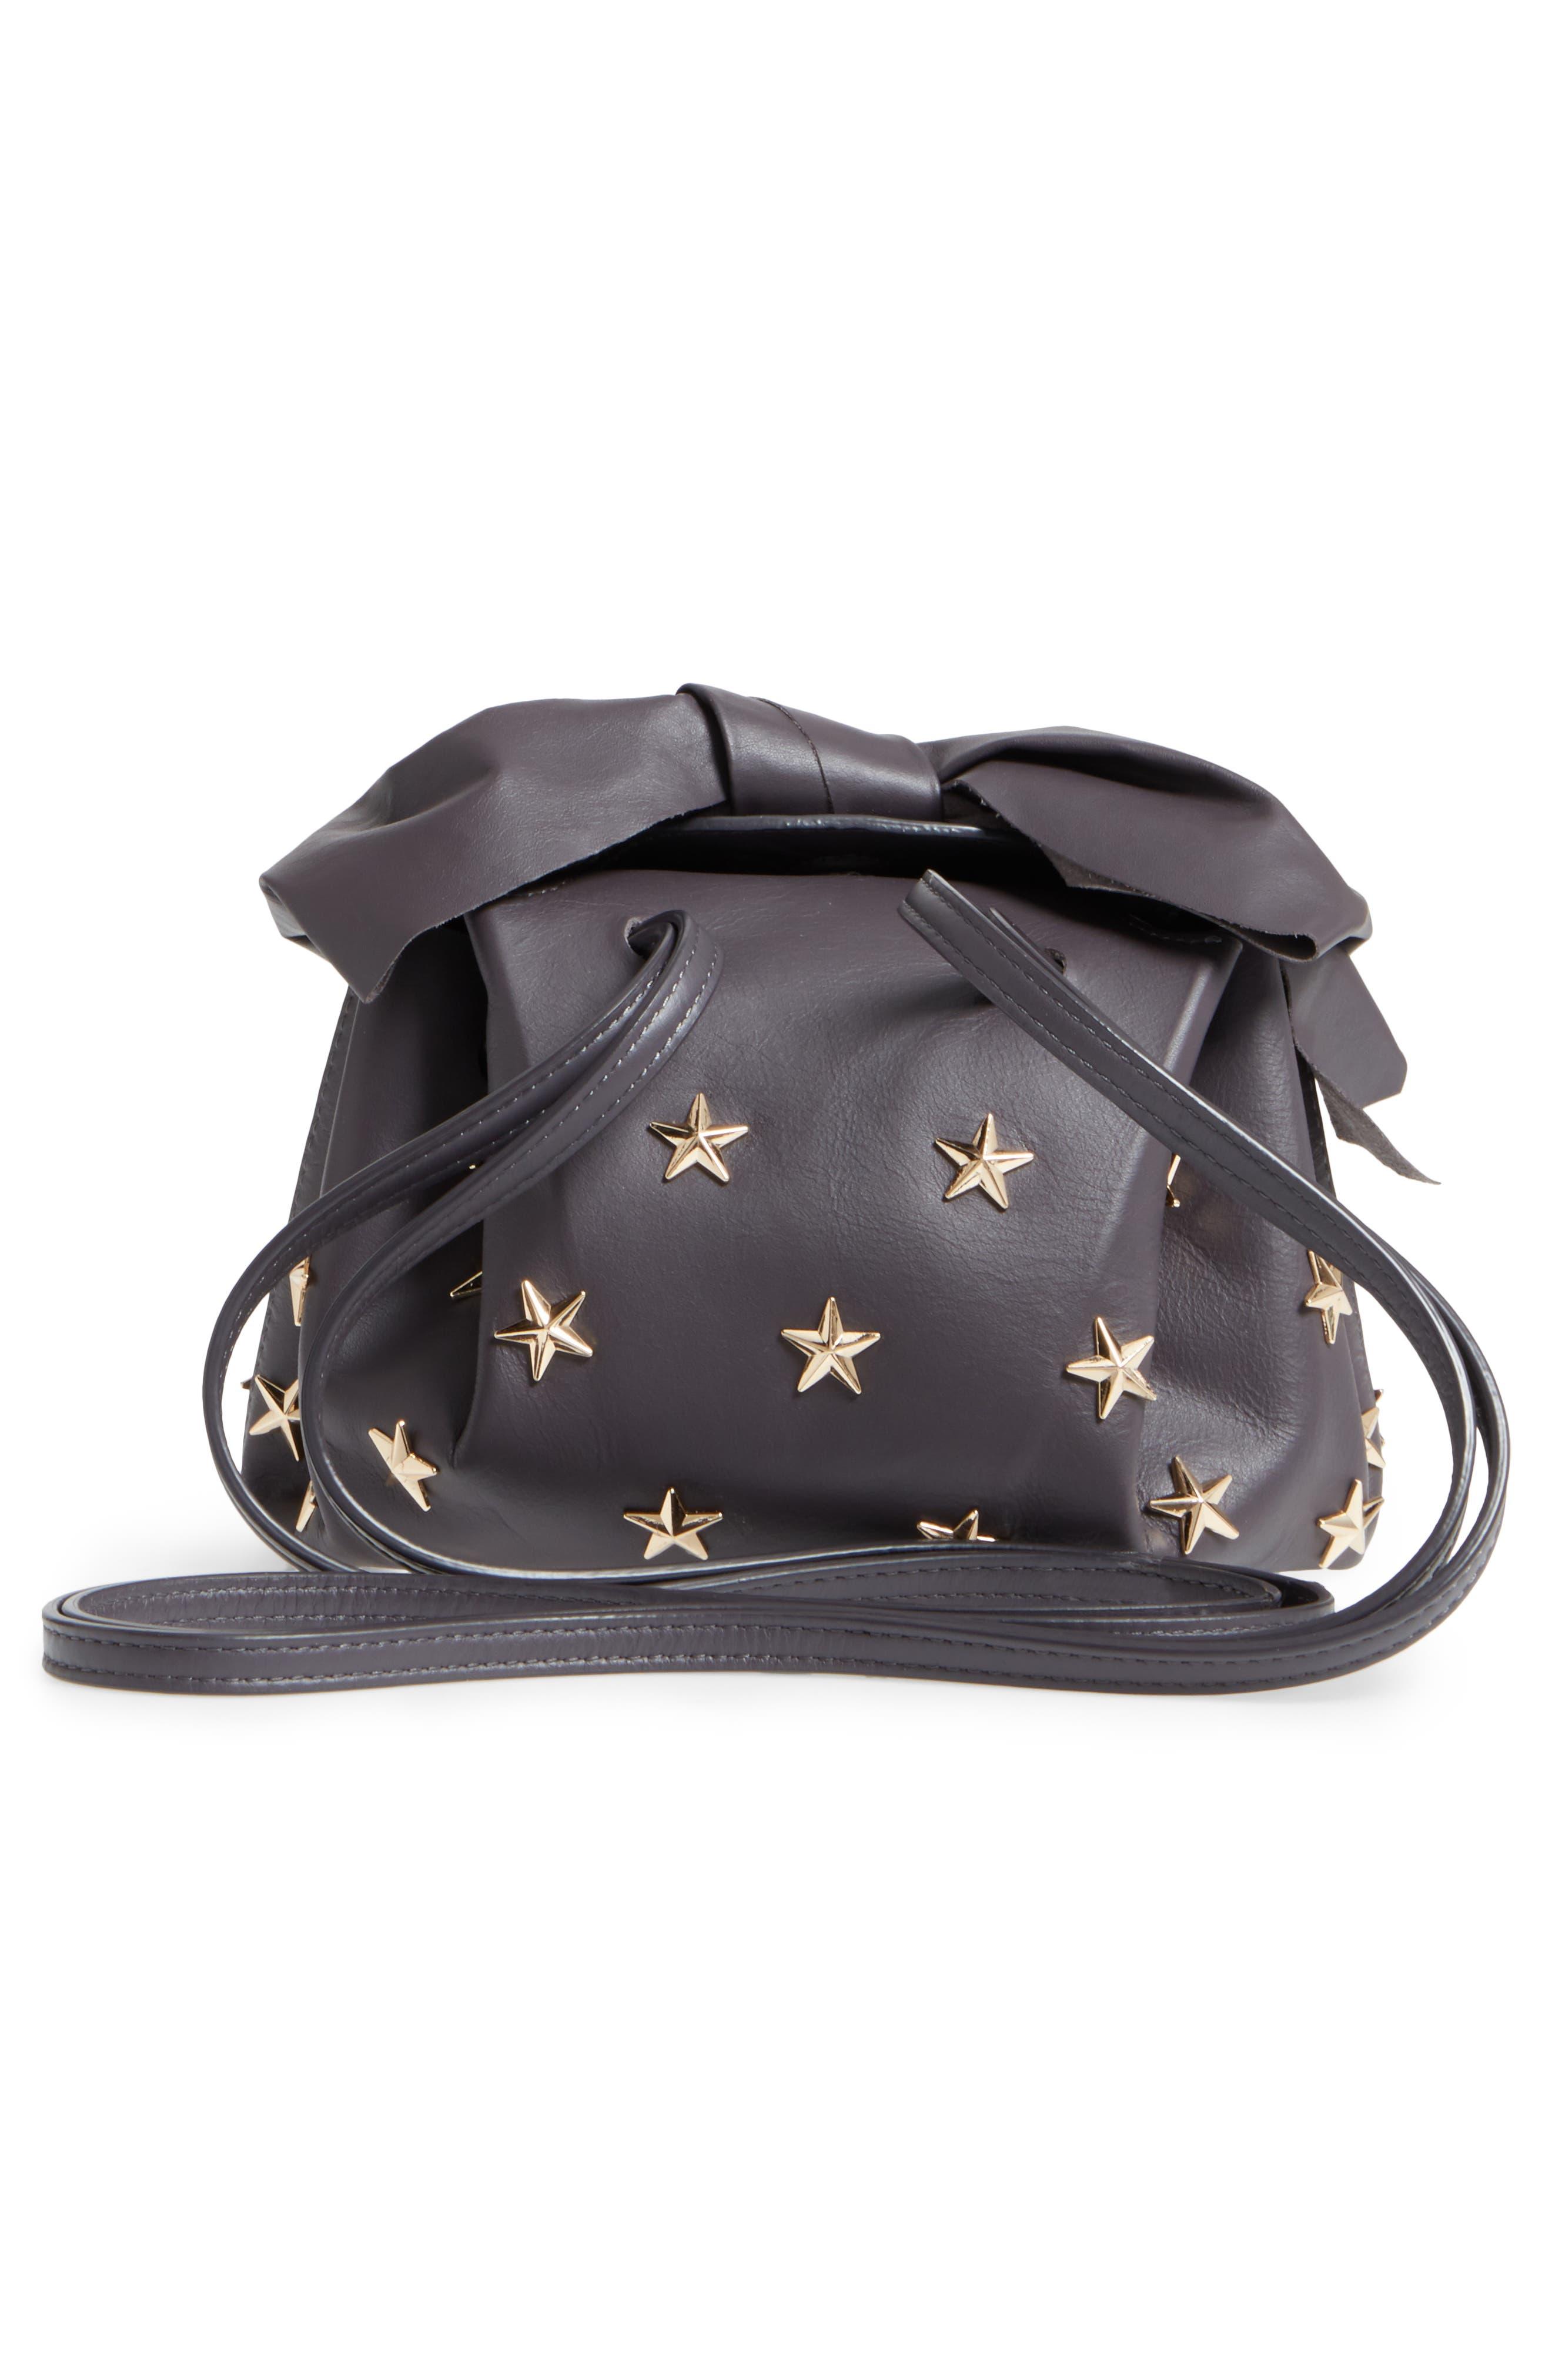 Soirée Star Stud Leather Crossbody Bag,                             Alternate thumbnail 3, color,                             020